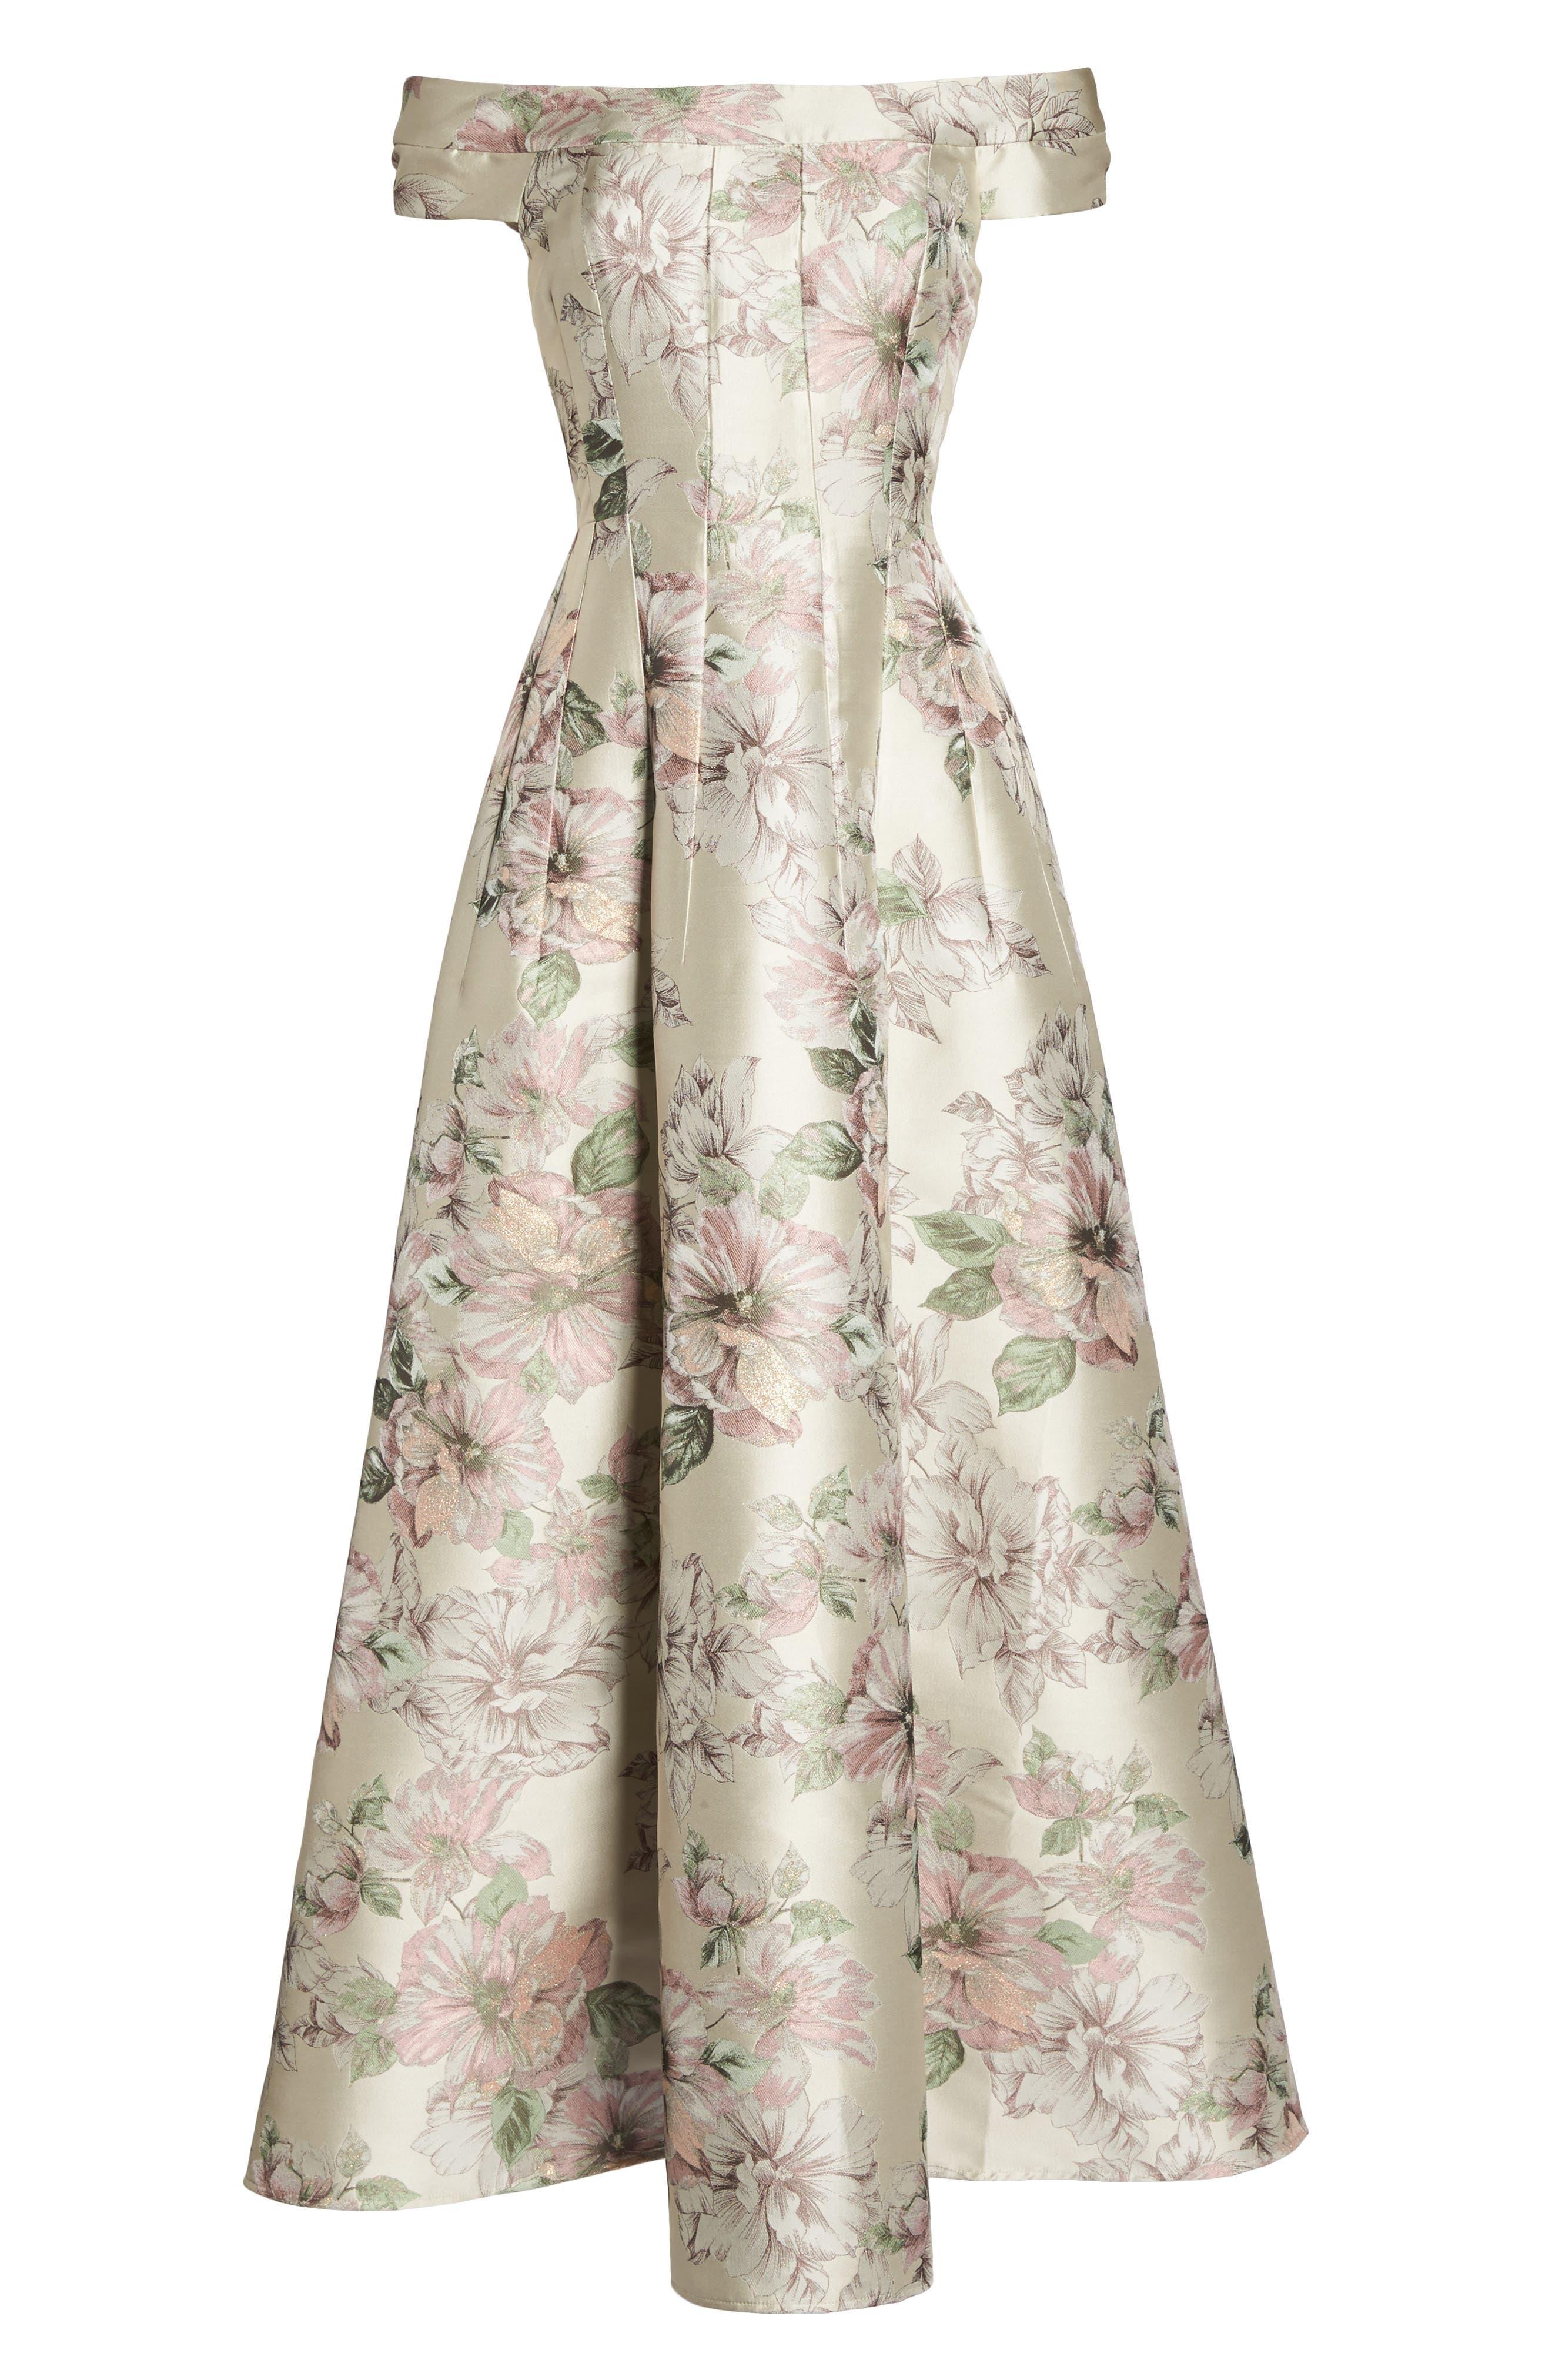 Floral Jacquard Off the Shoulder Ballgown,                             Alternate thumbnail 6, color,                             Blush